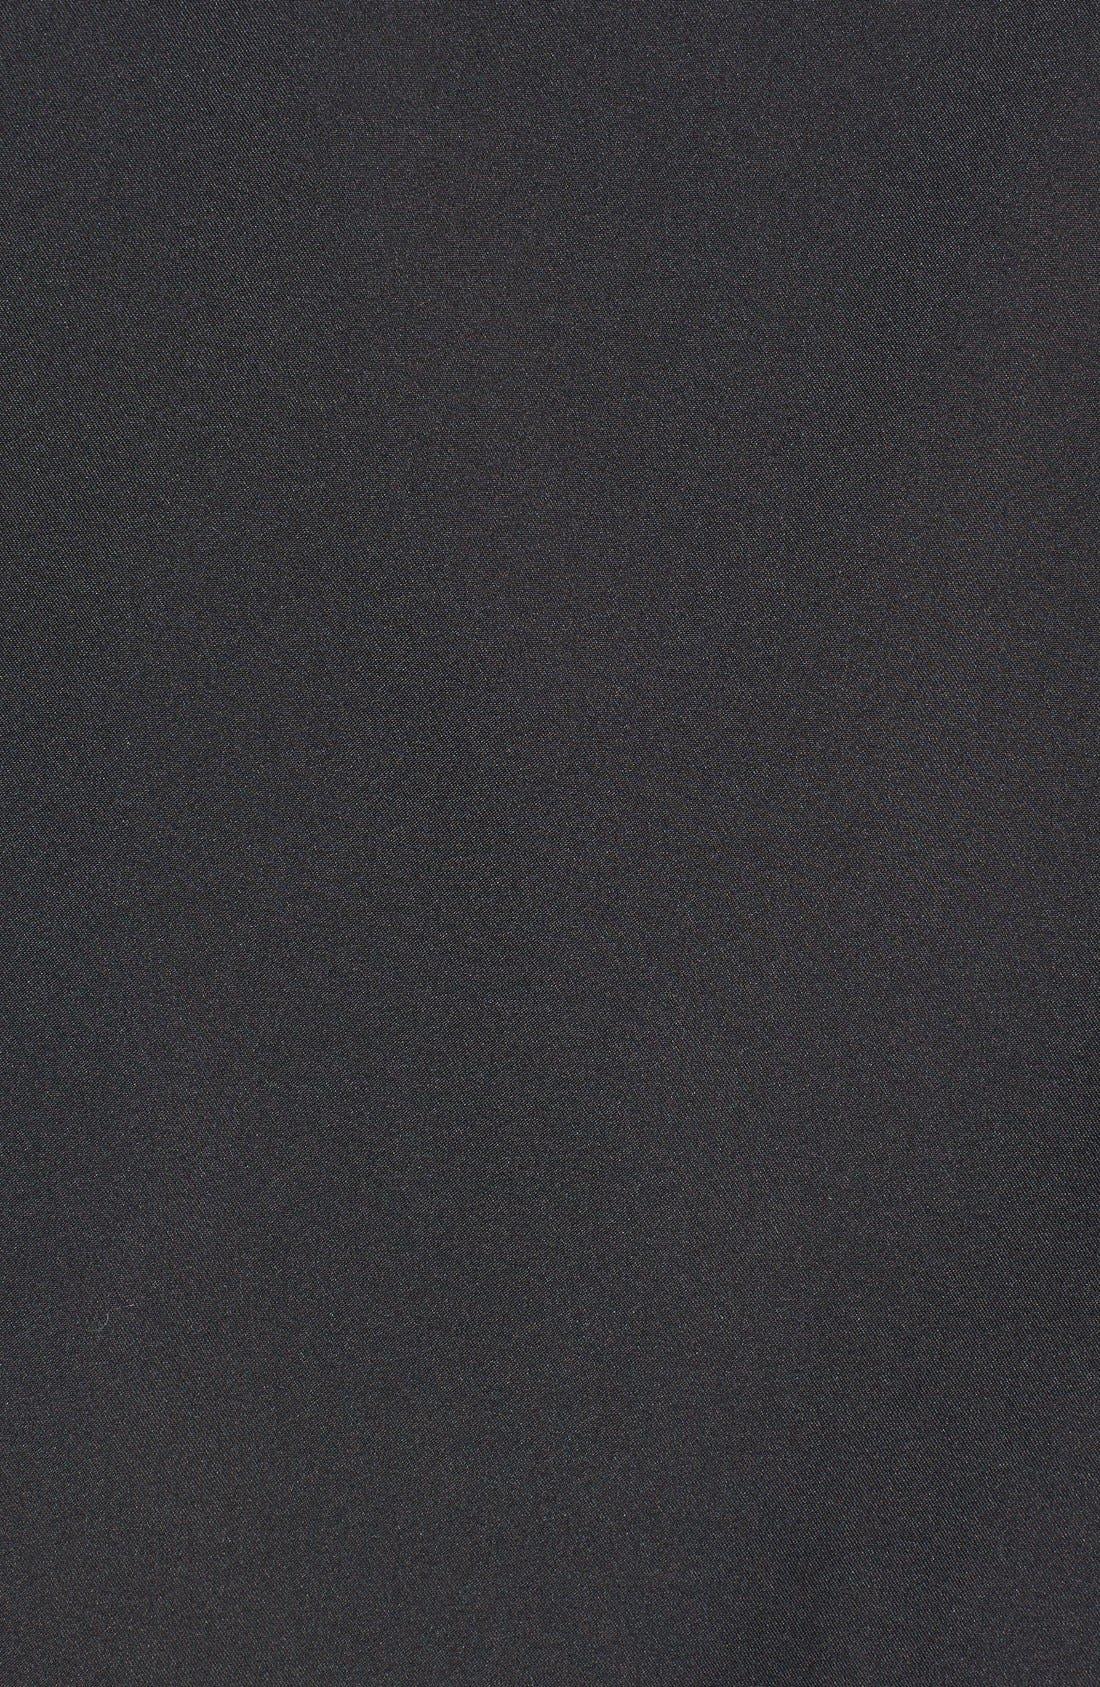 New Orleans Saints - Beacon WeatherTec Wind & Water Resistant Jacket,                             Alternate thumbnail 3, color,                             001